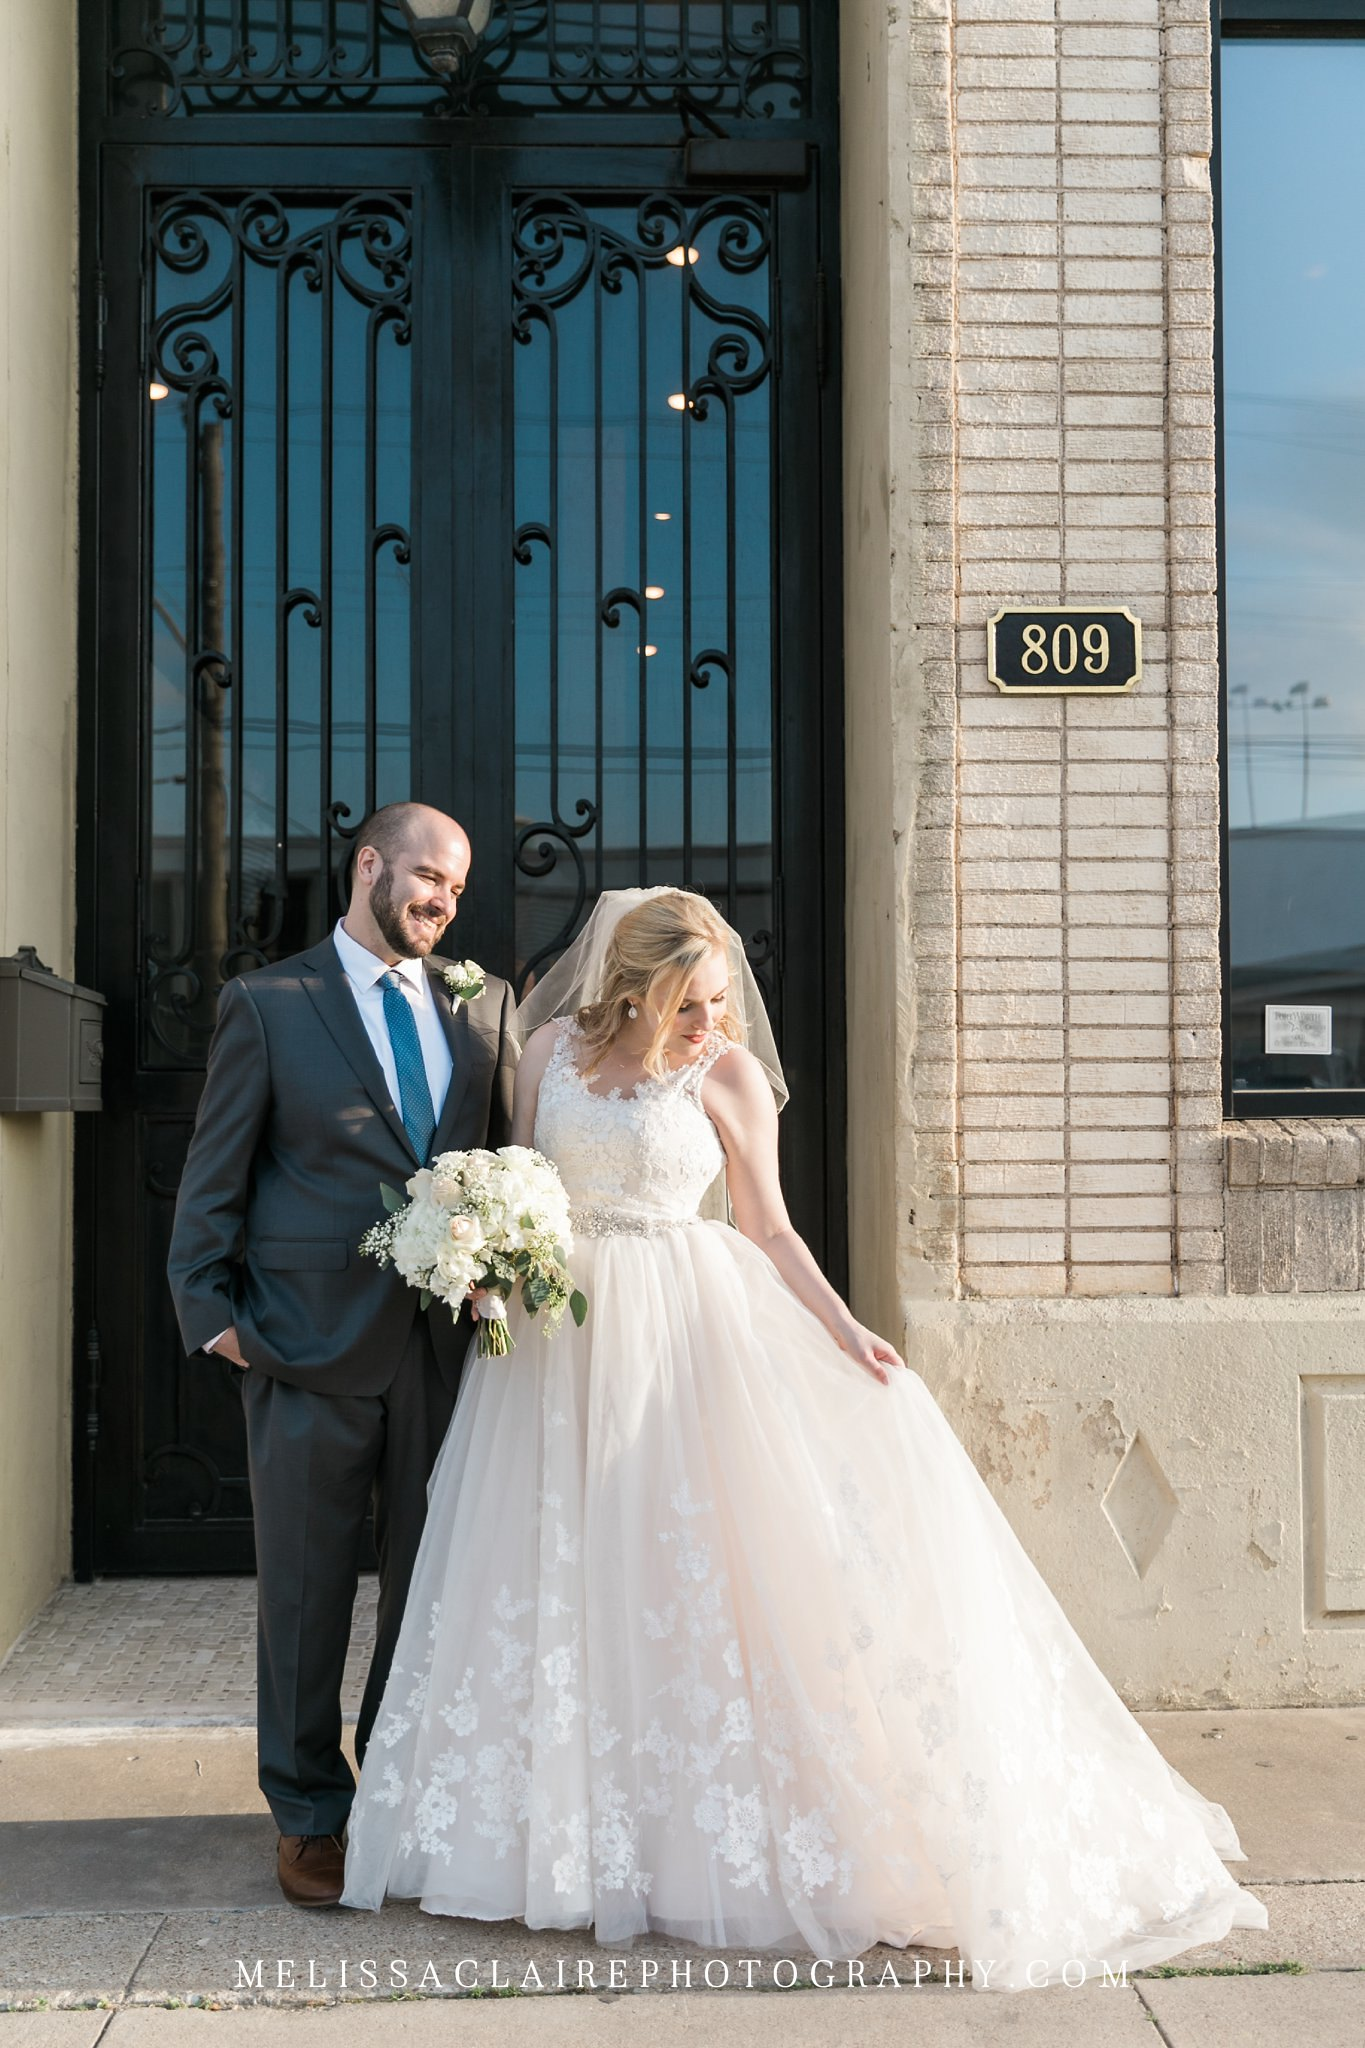 809_at_vickery_wedding_0033